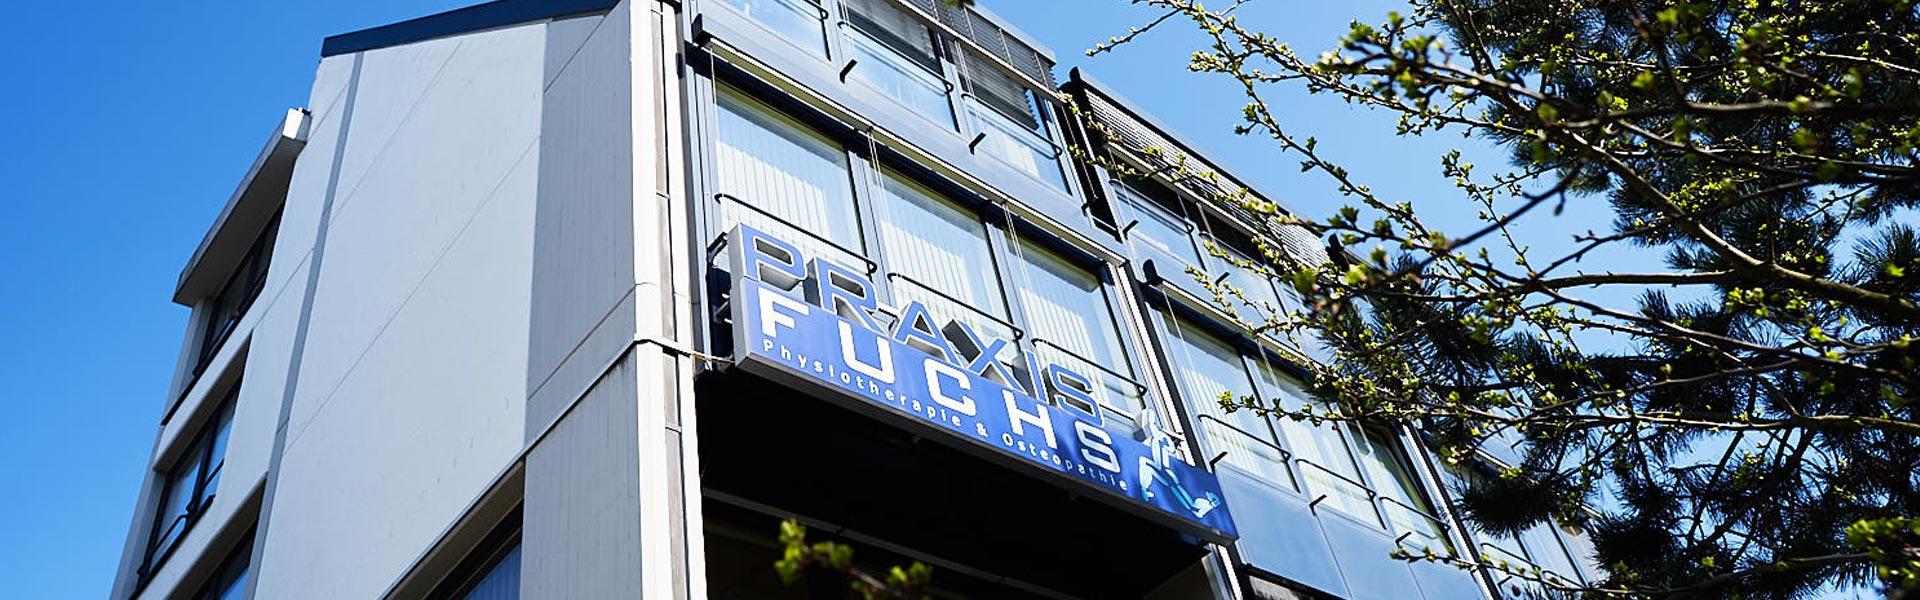 Praxis Fuchs Physiotherapie Osteopathie